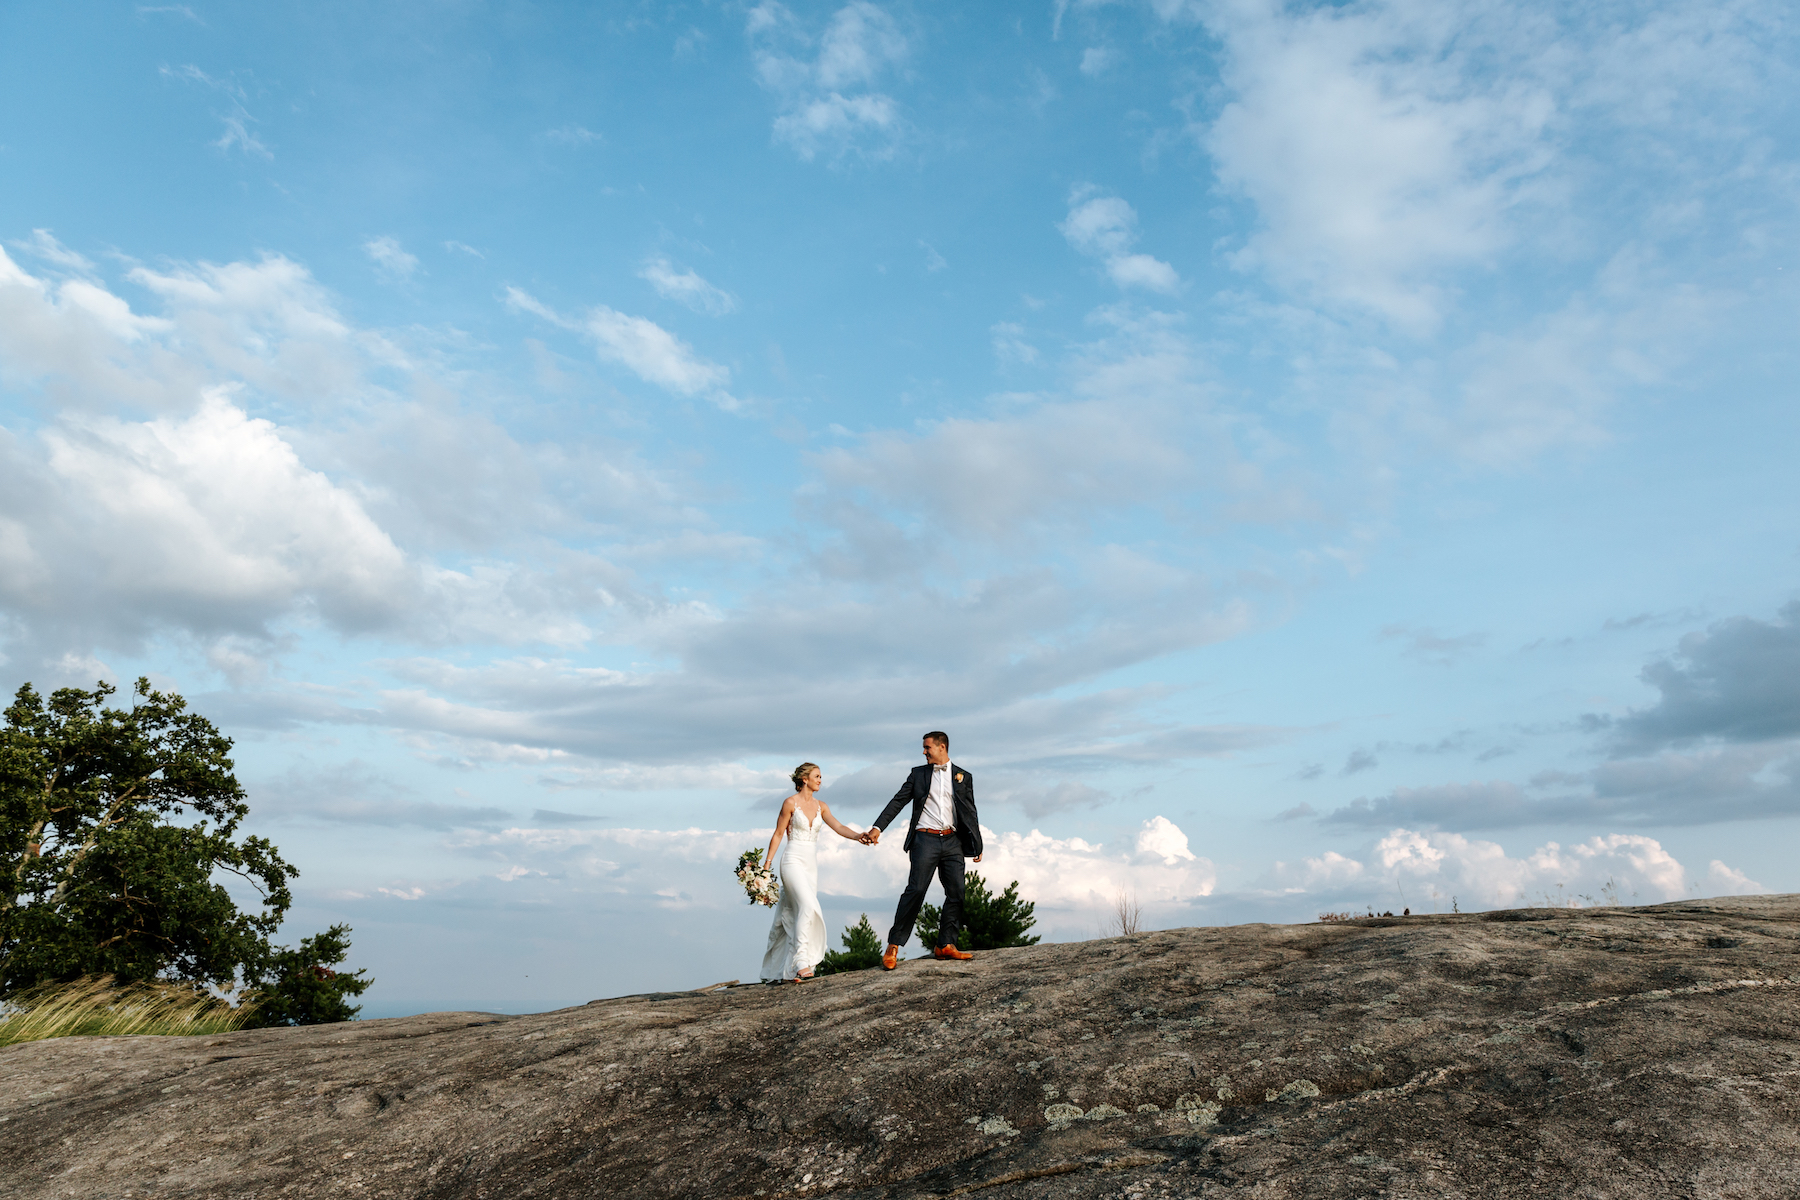 wedding-engagement-photographer-spartanburg-greenville-columbia-carolina-south-north-534.JPG